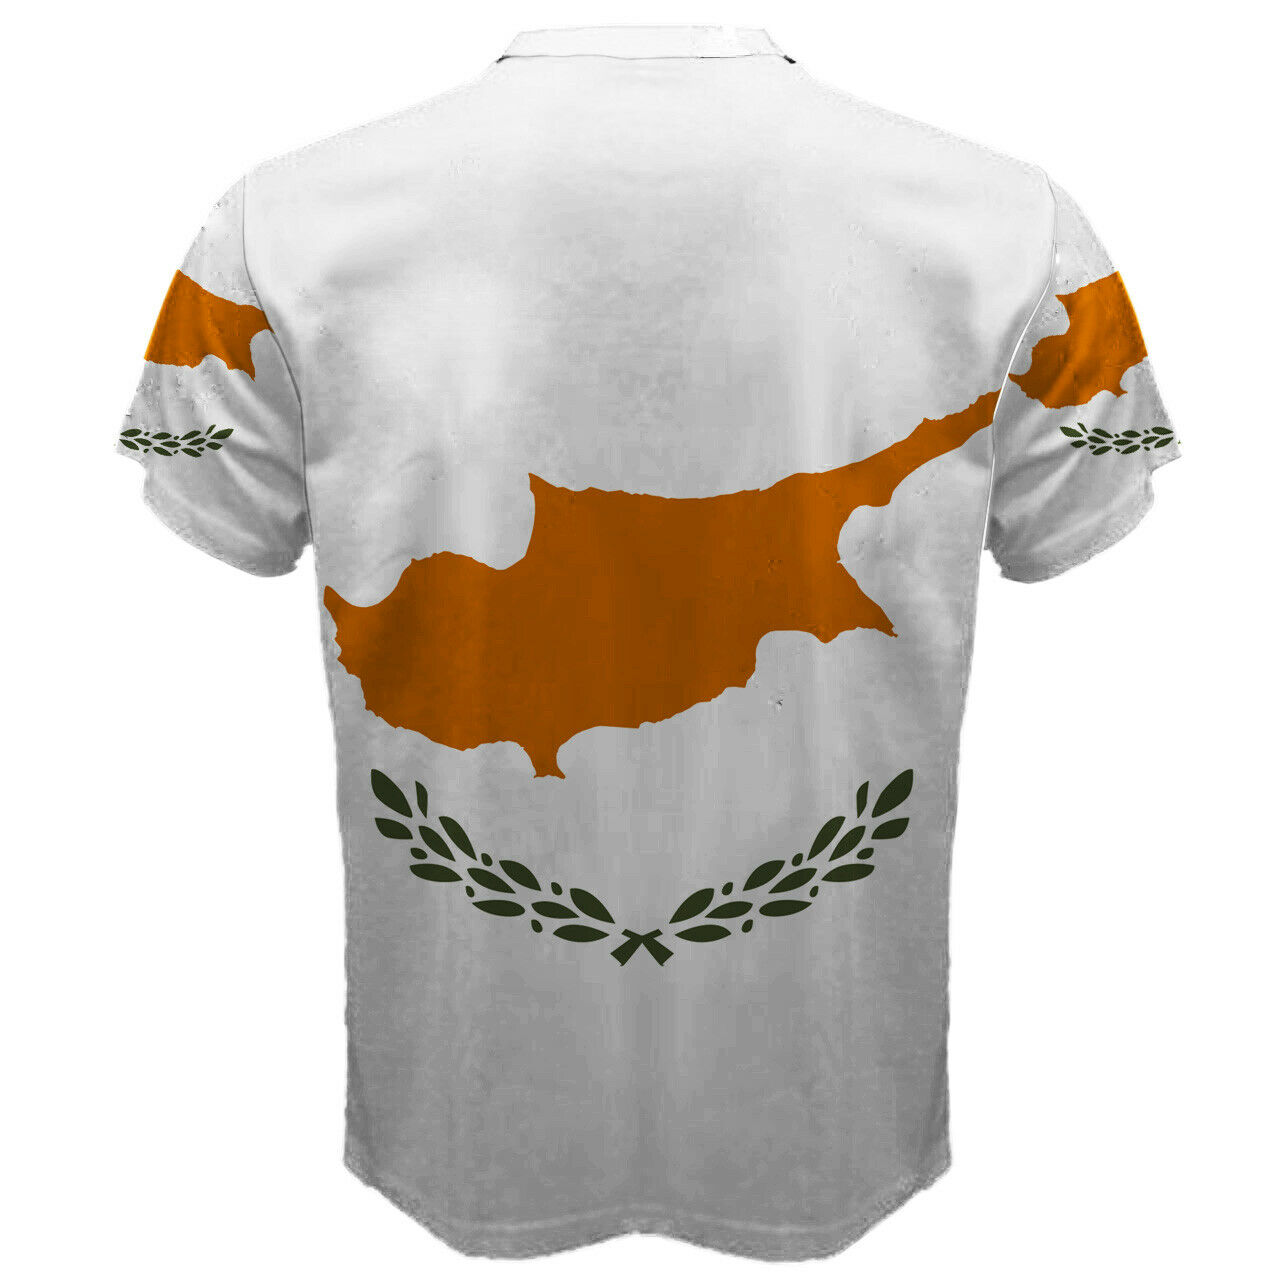 Лучшая цена на заказ футболка с печатью логотипа пустая футболка